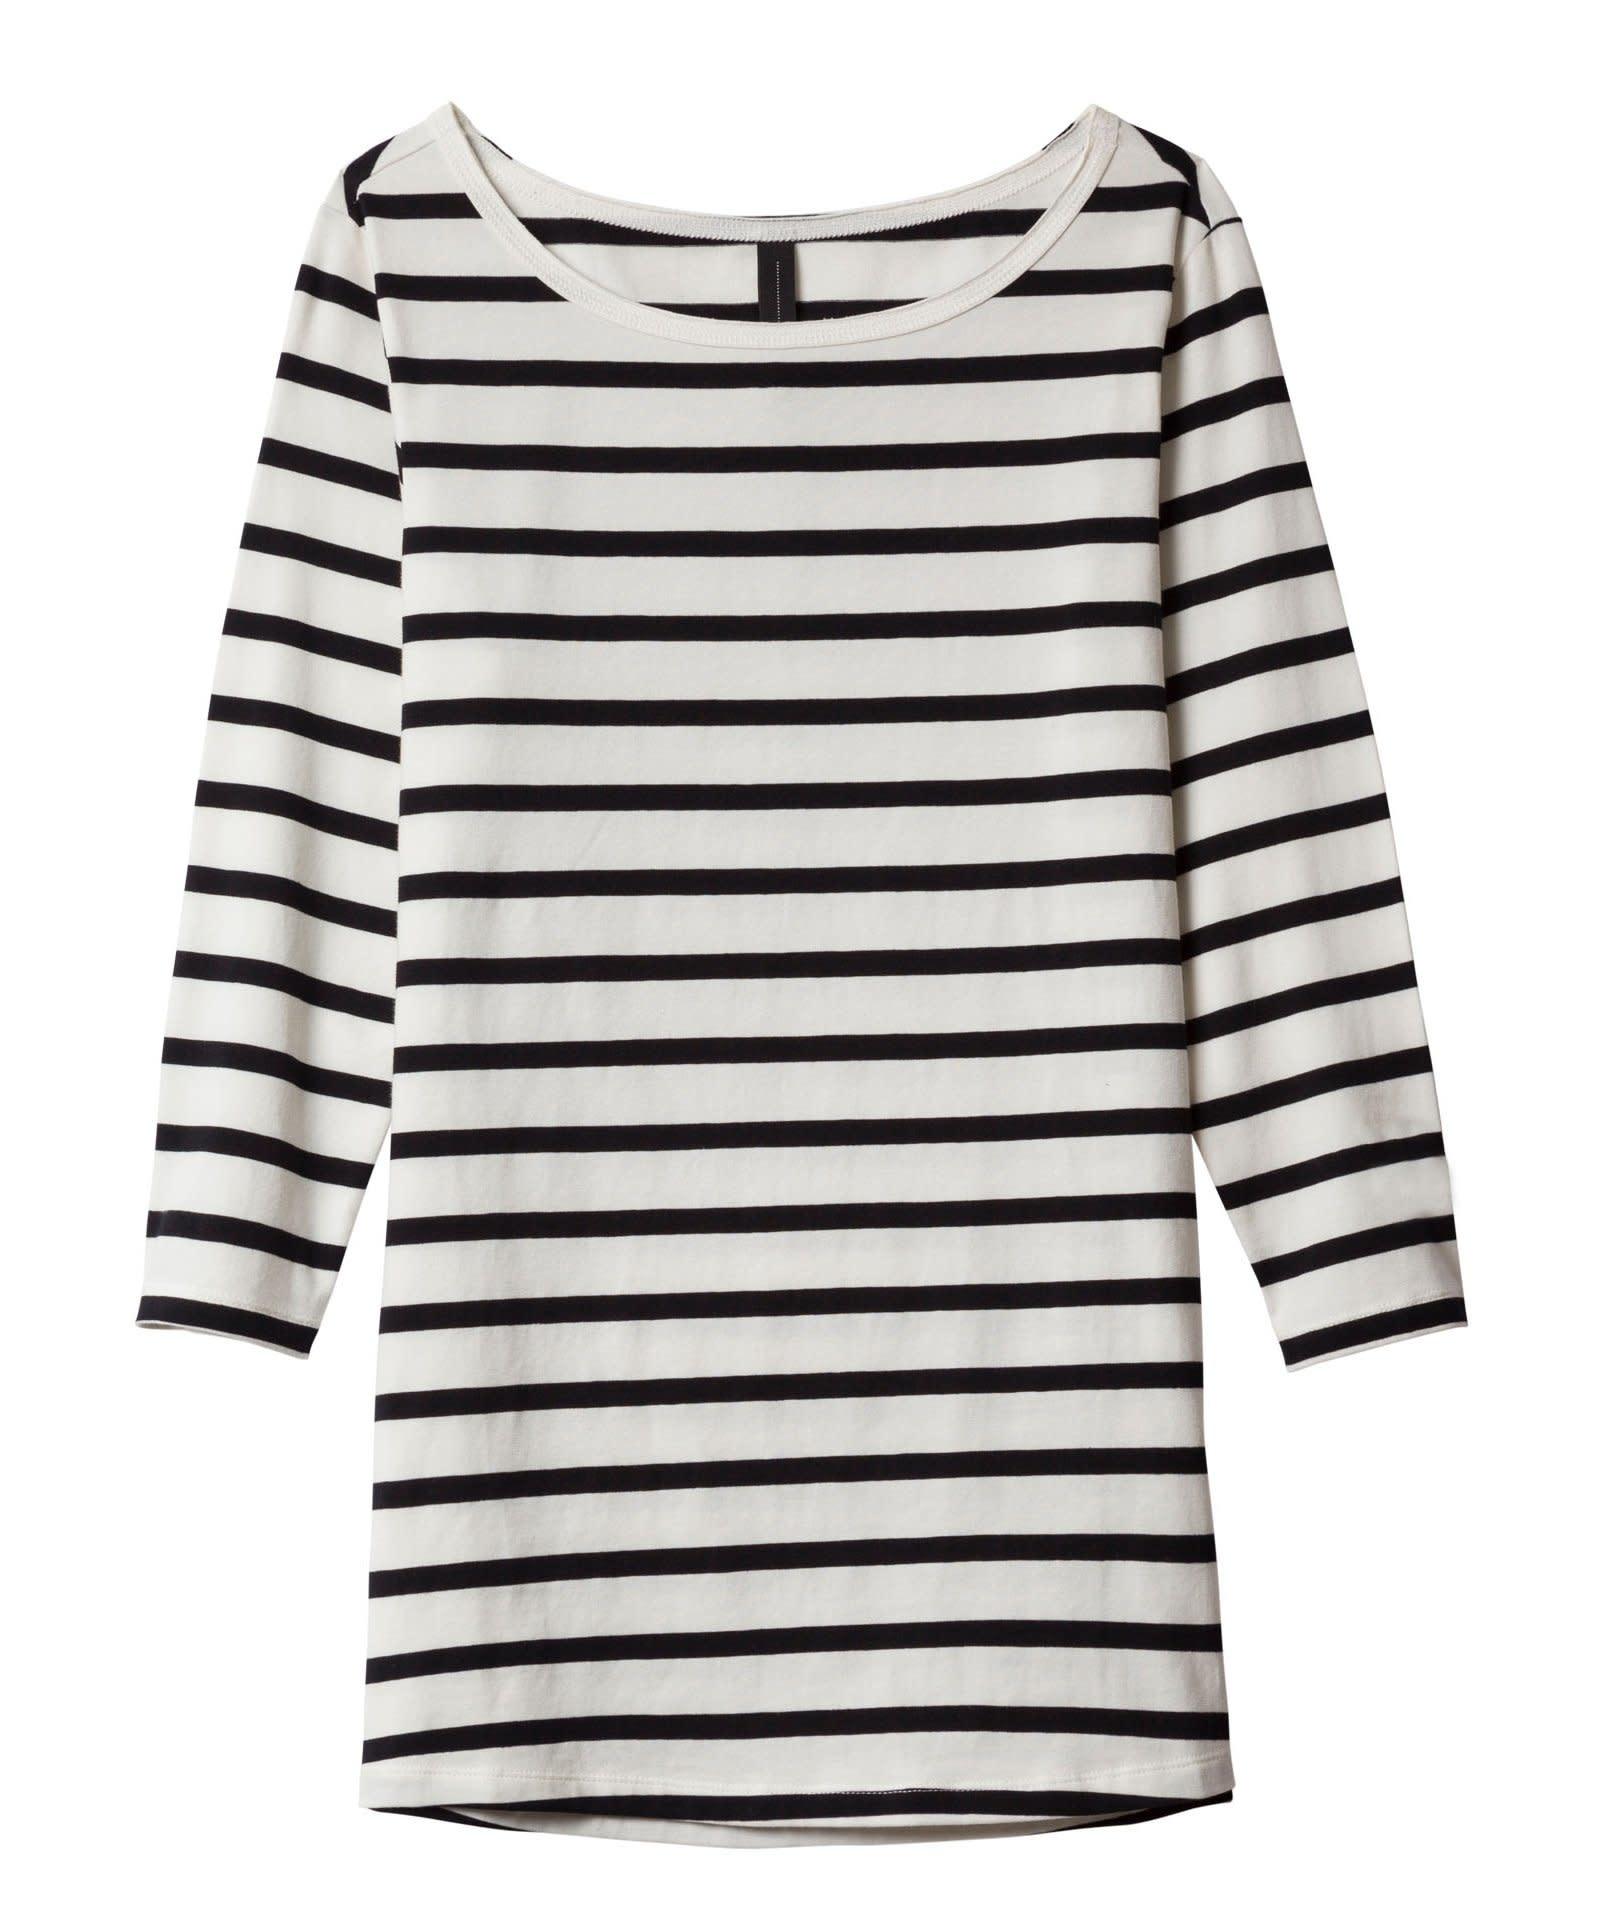 Shirt slim fit boat neck tee-1